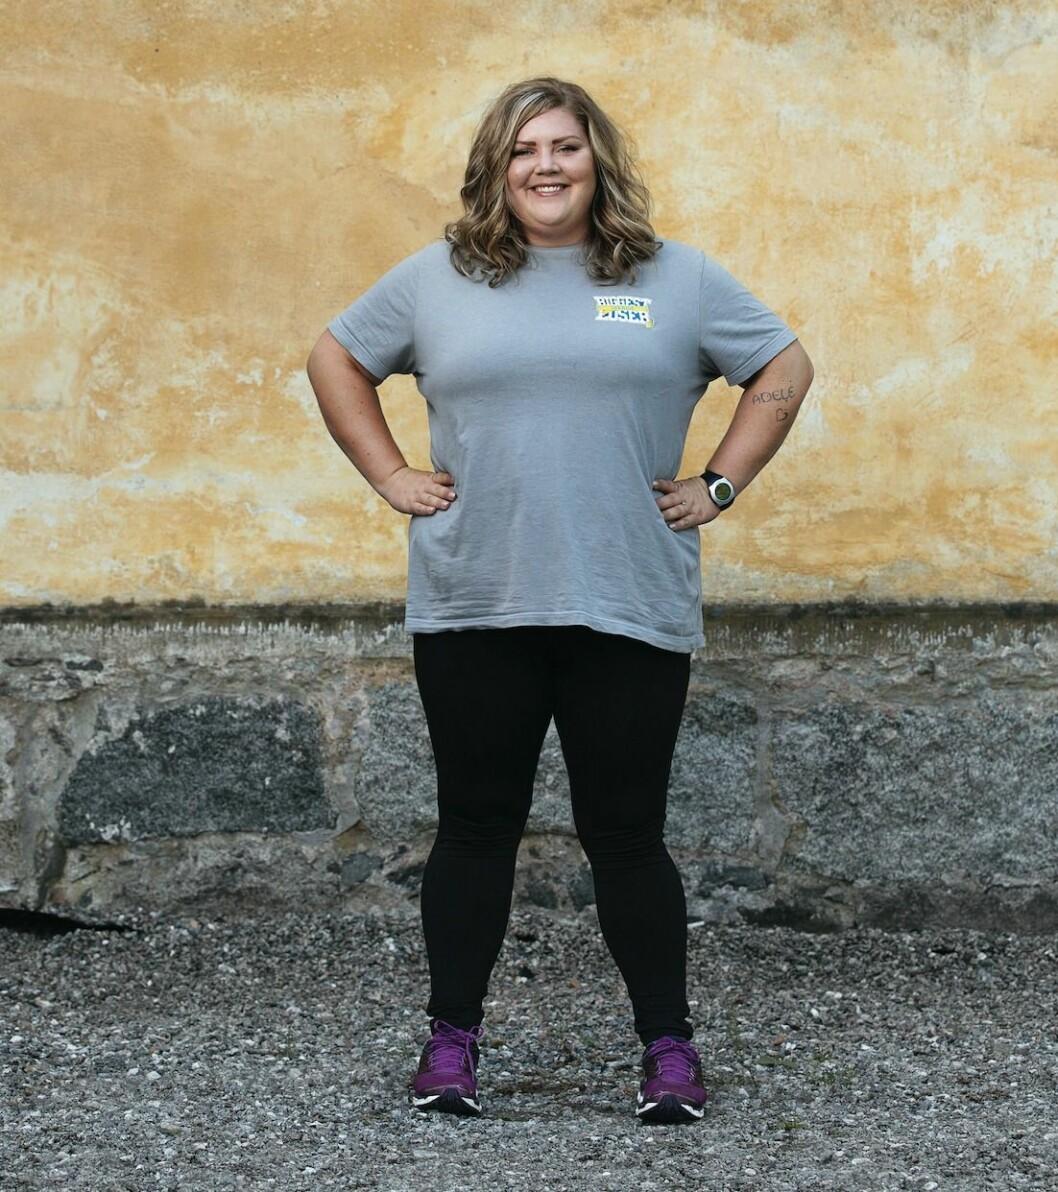 Petra Holmlund, Sorsele i Biggest loser 2020